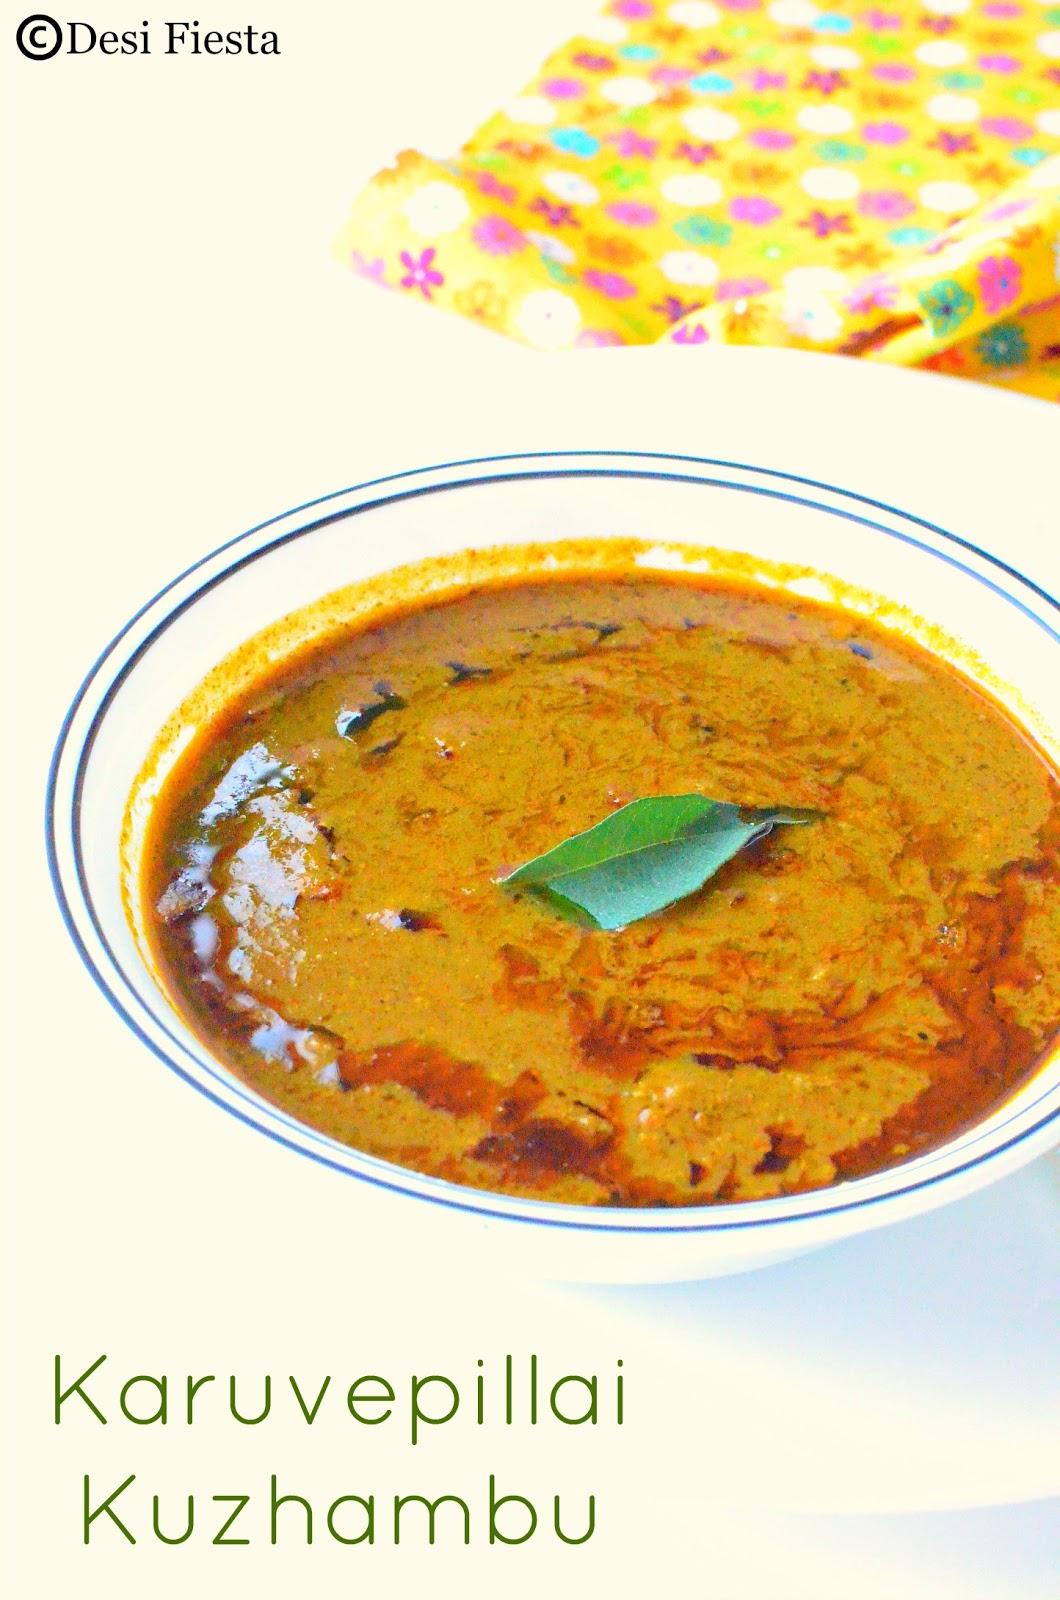 Curry leaves Kozhambu